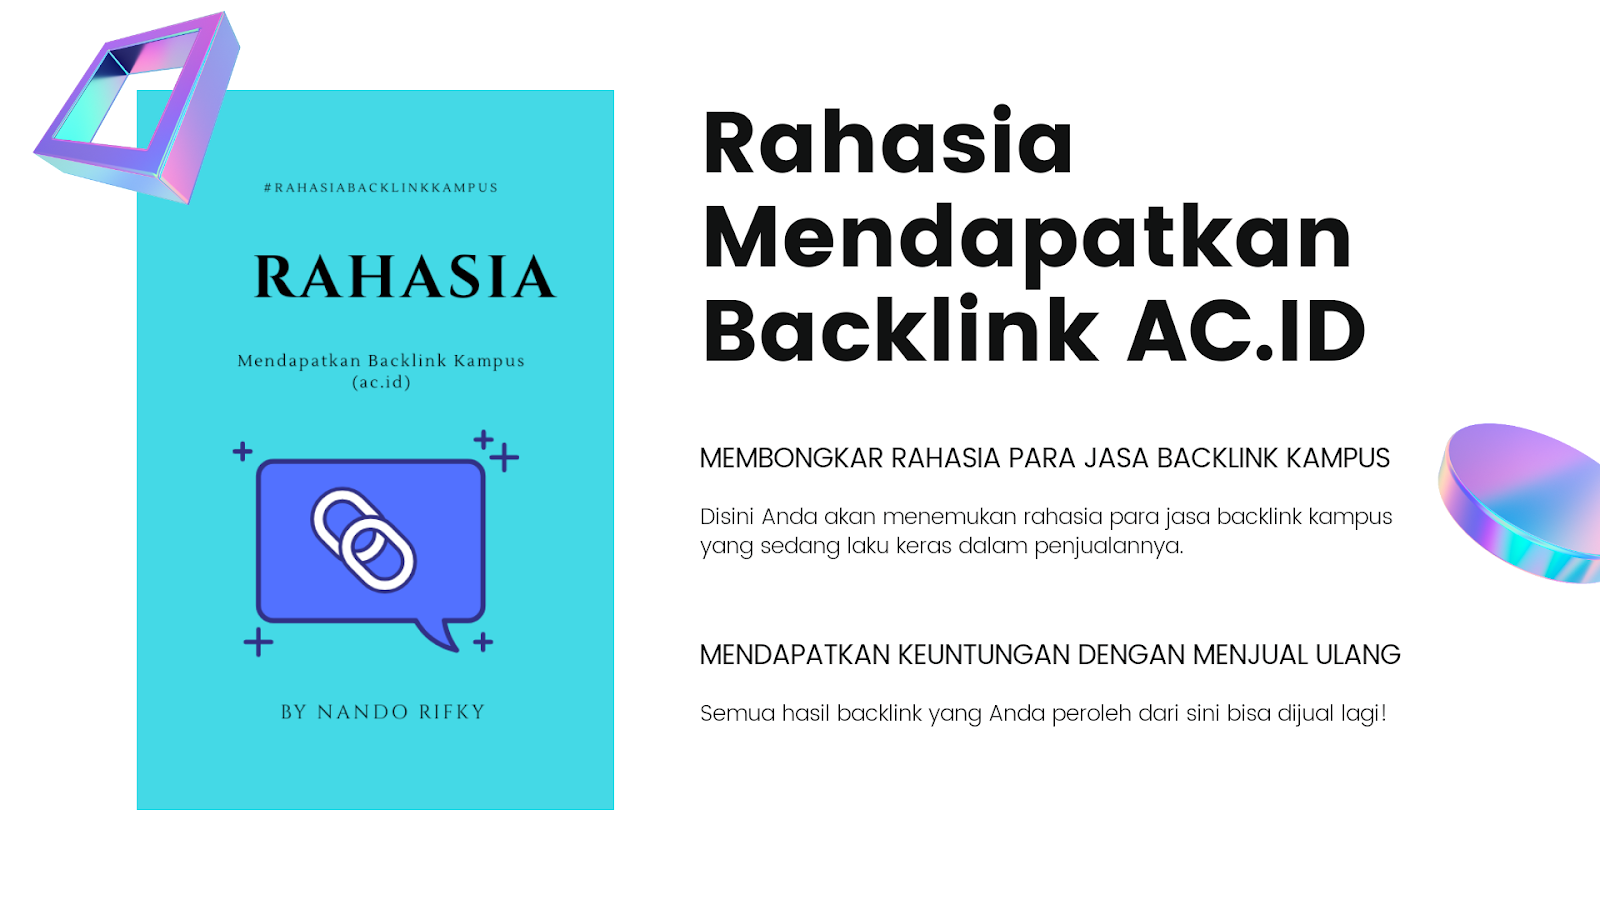 Jasa Backlink Kampus